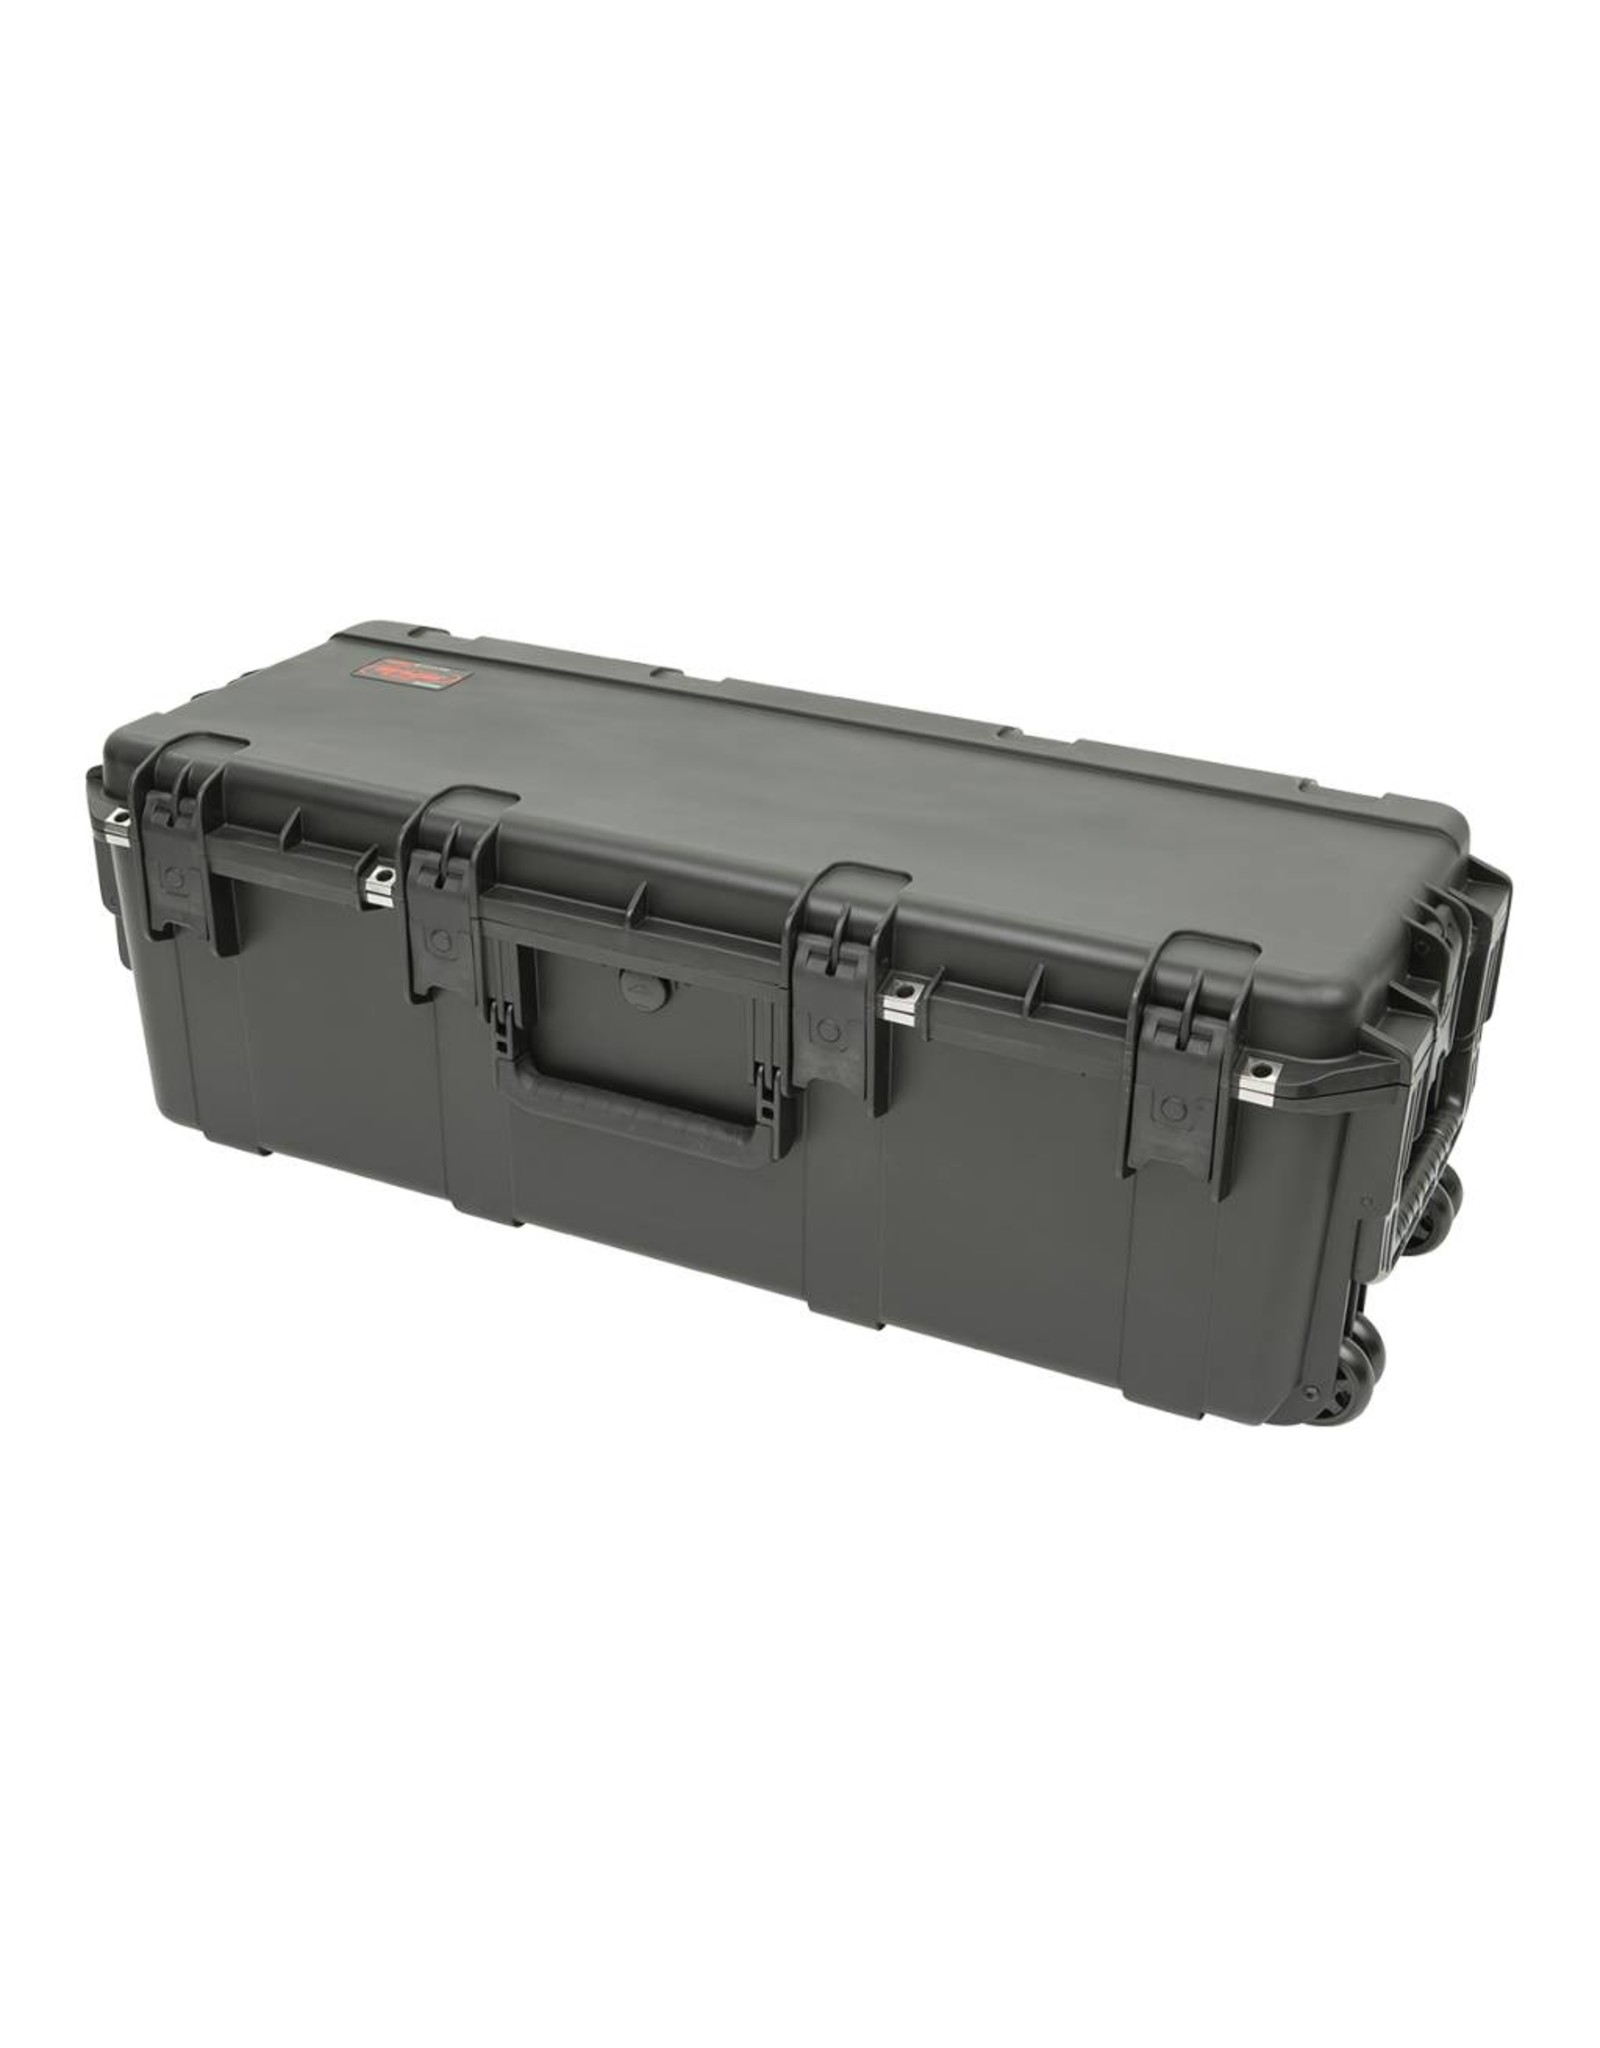 SKB Cases SKB iSeries 3613-12 Waterproof Utility Case w/layered foam